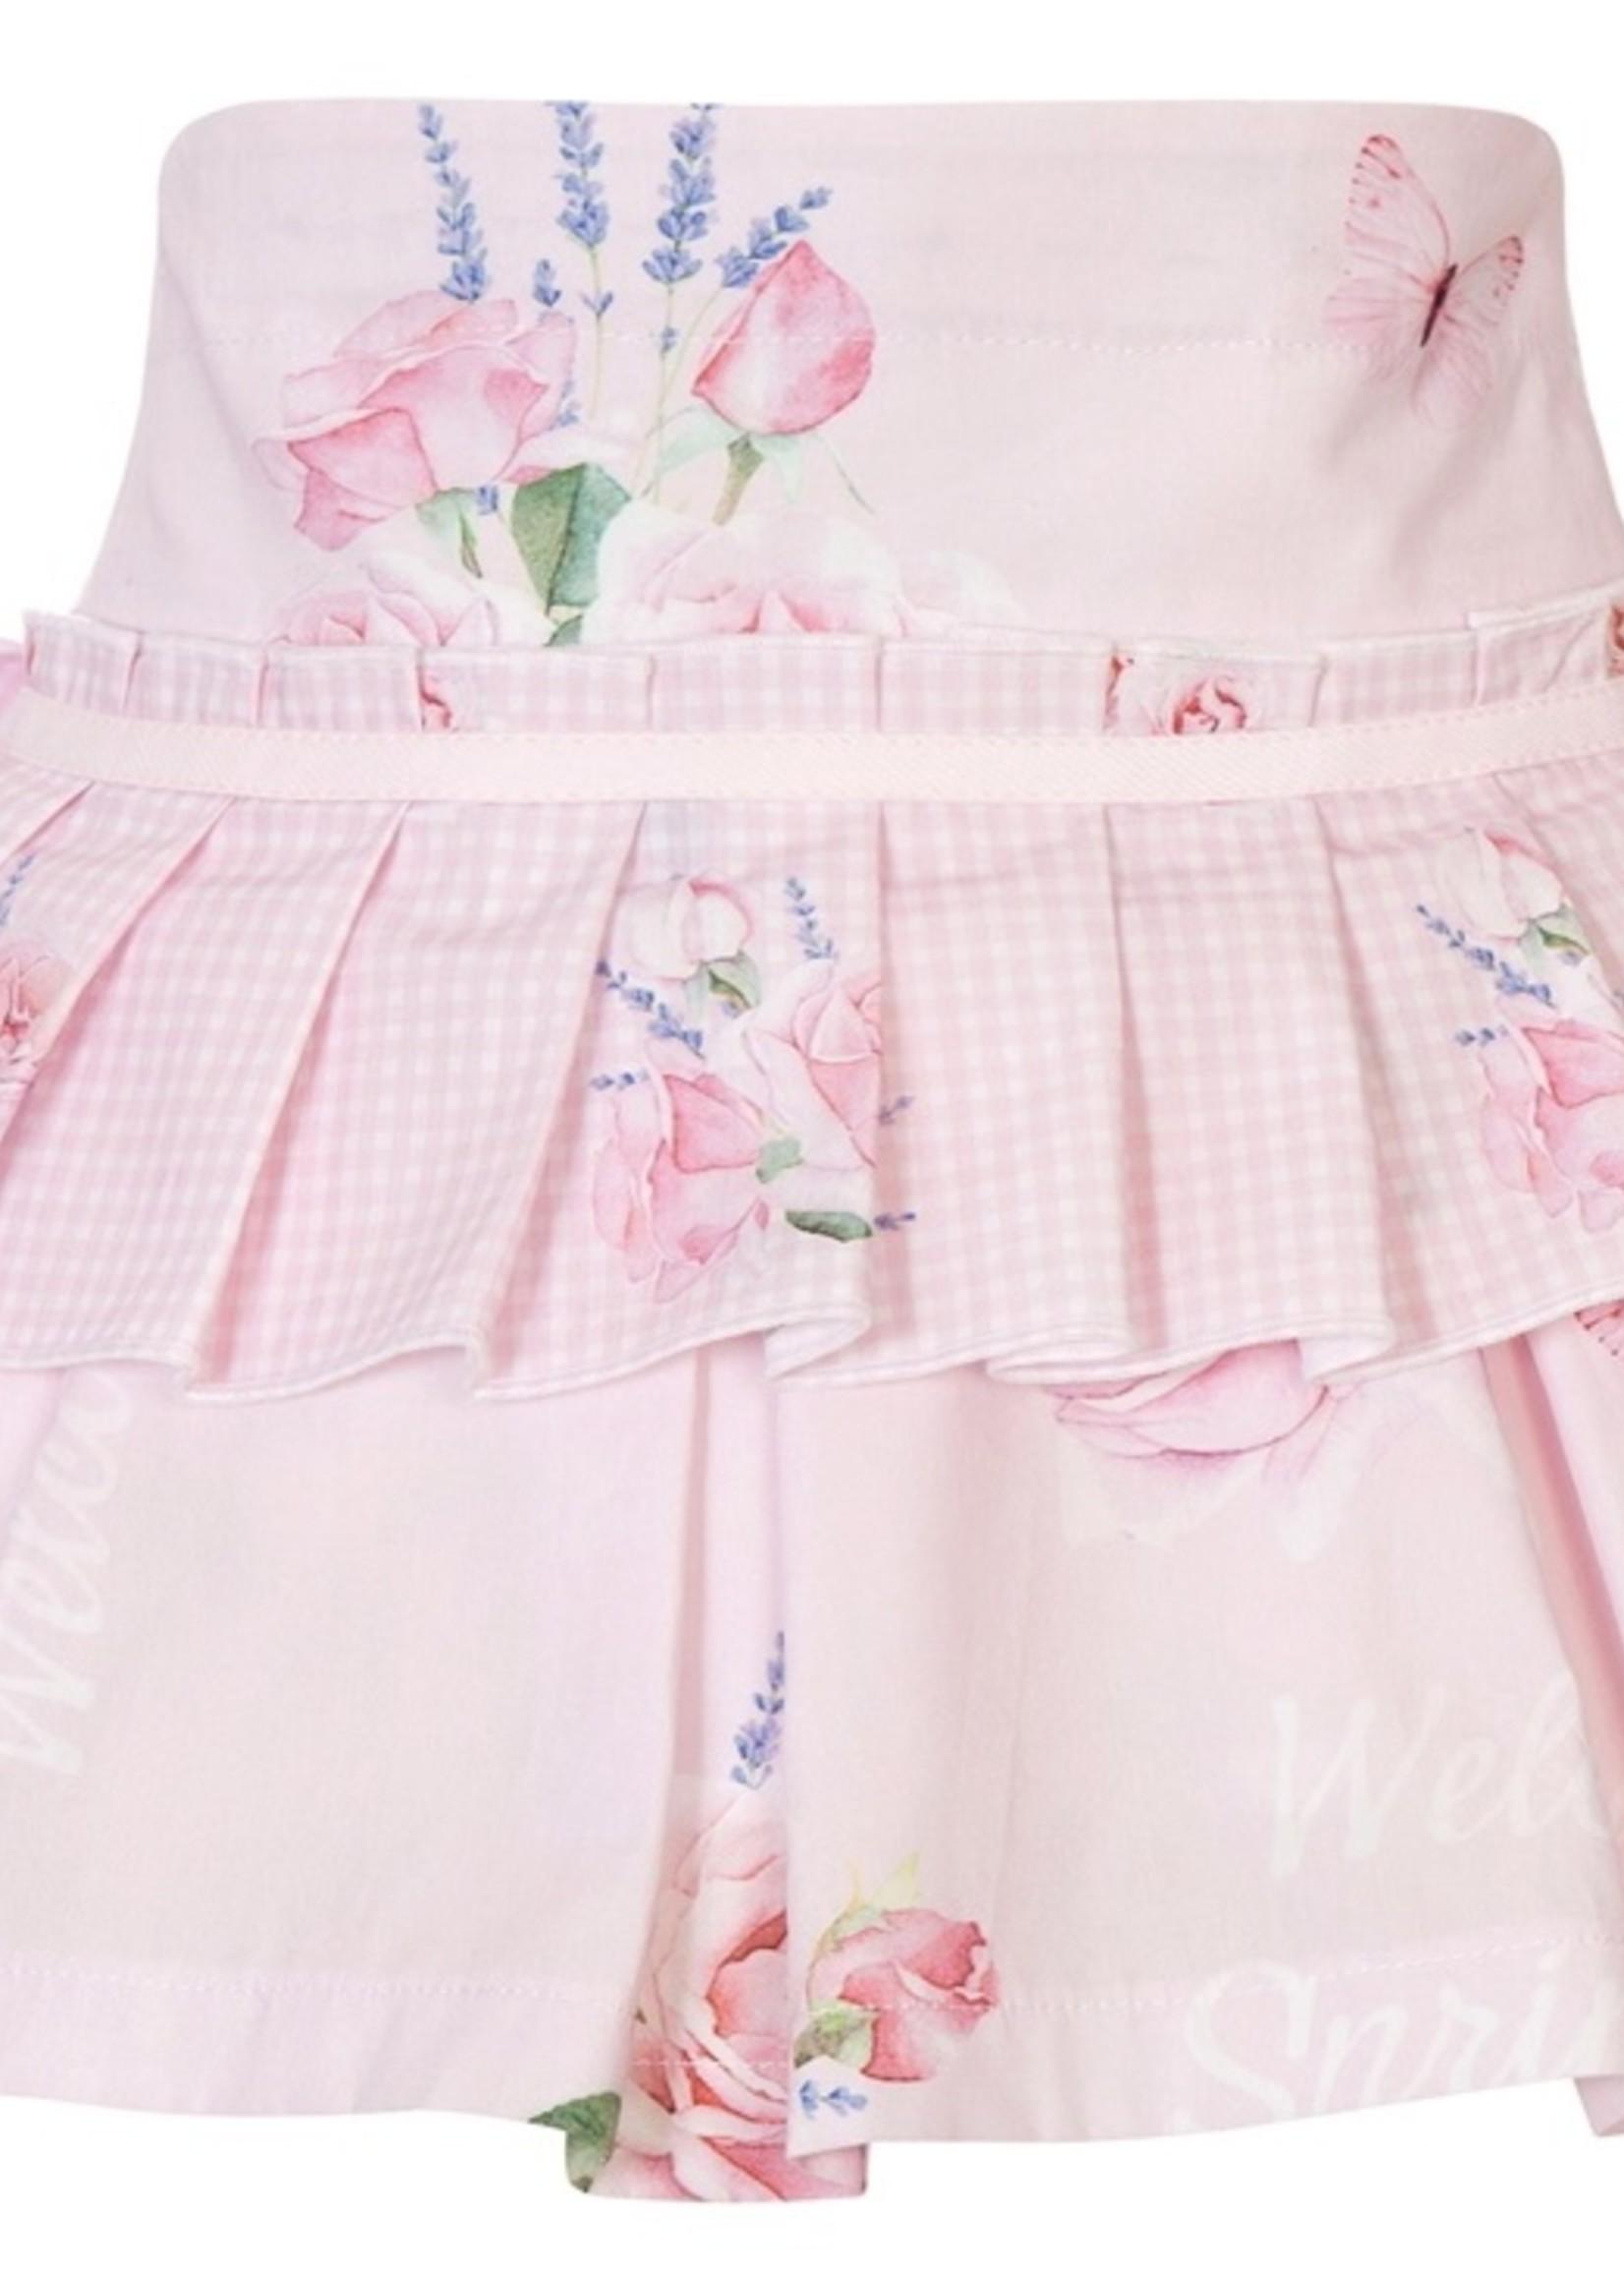 Balloon Chic Balloon Chic skirt pink 715